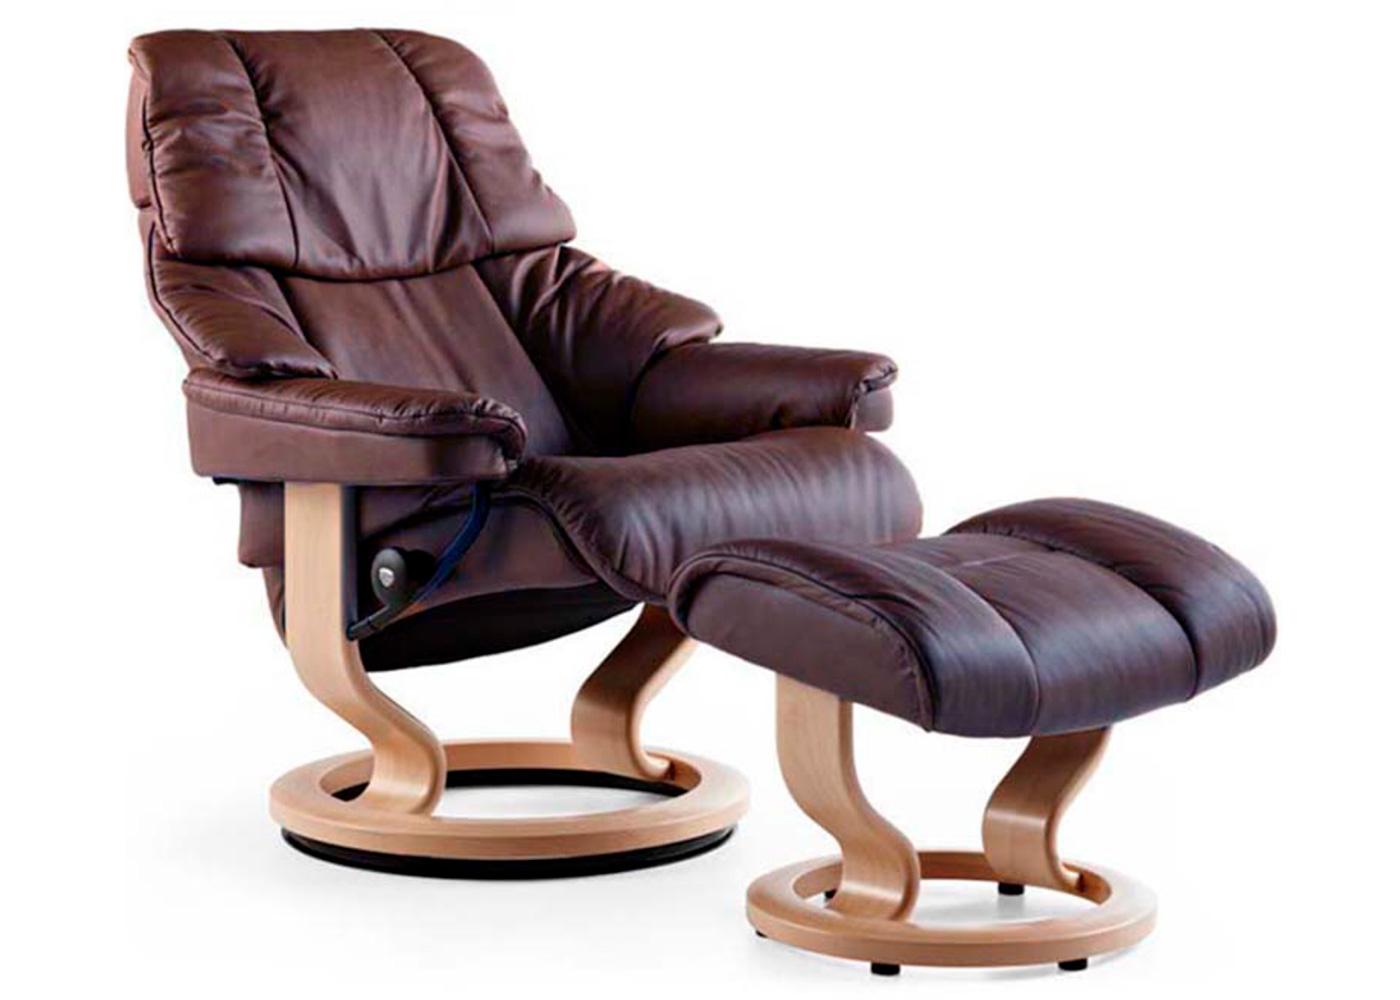 natuzzi revive chair sherpa dish stressless reno and stool - midfurn furniture superstore